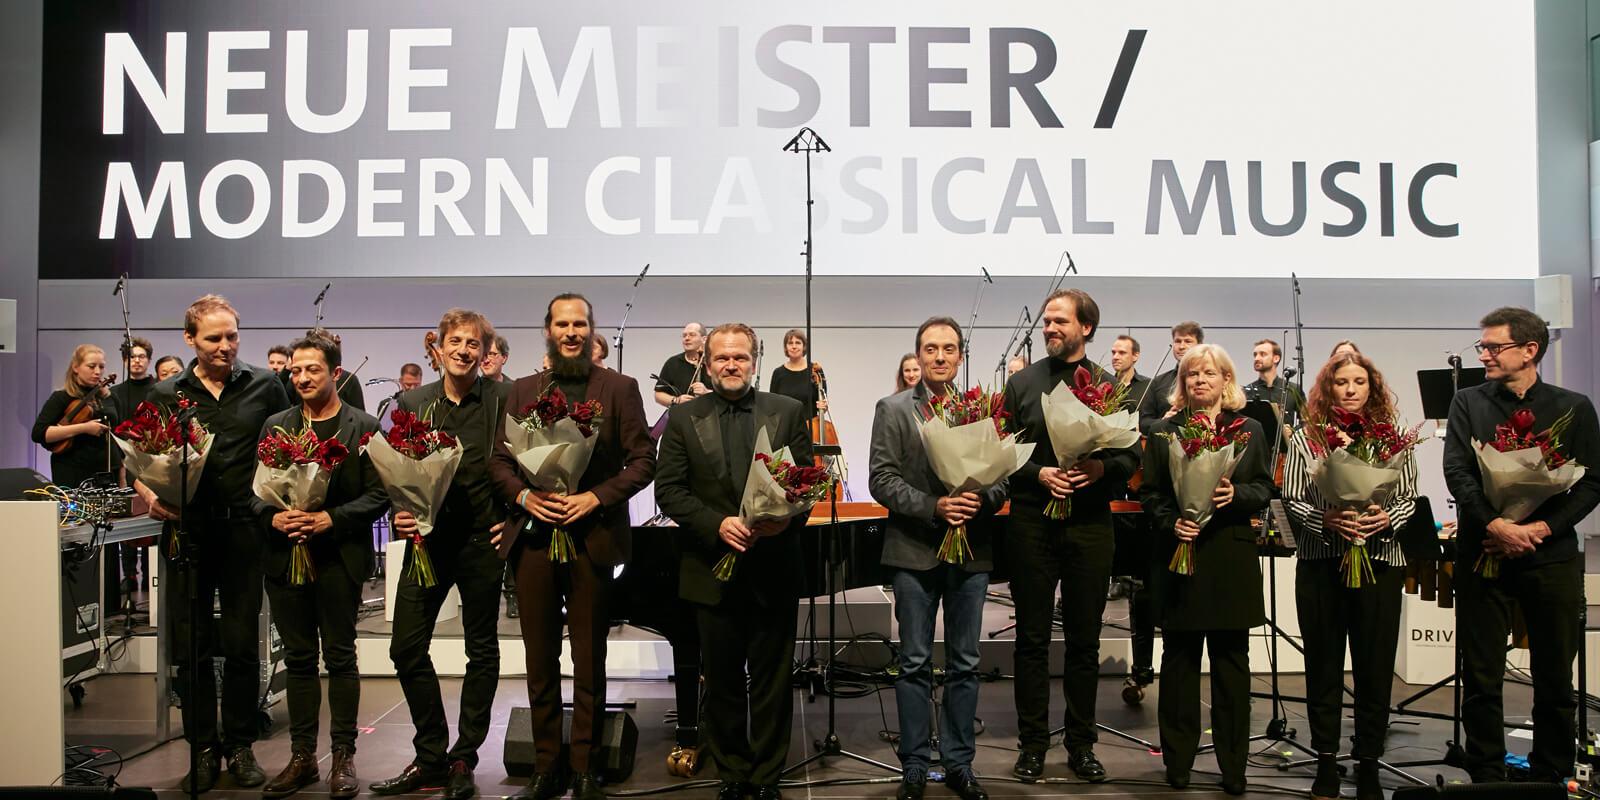 Neue Meister Konzert 2017 Berlin